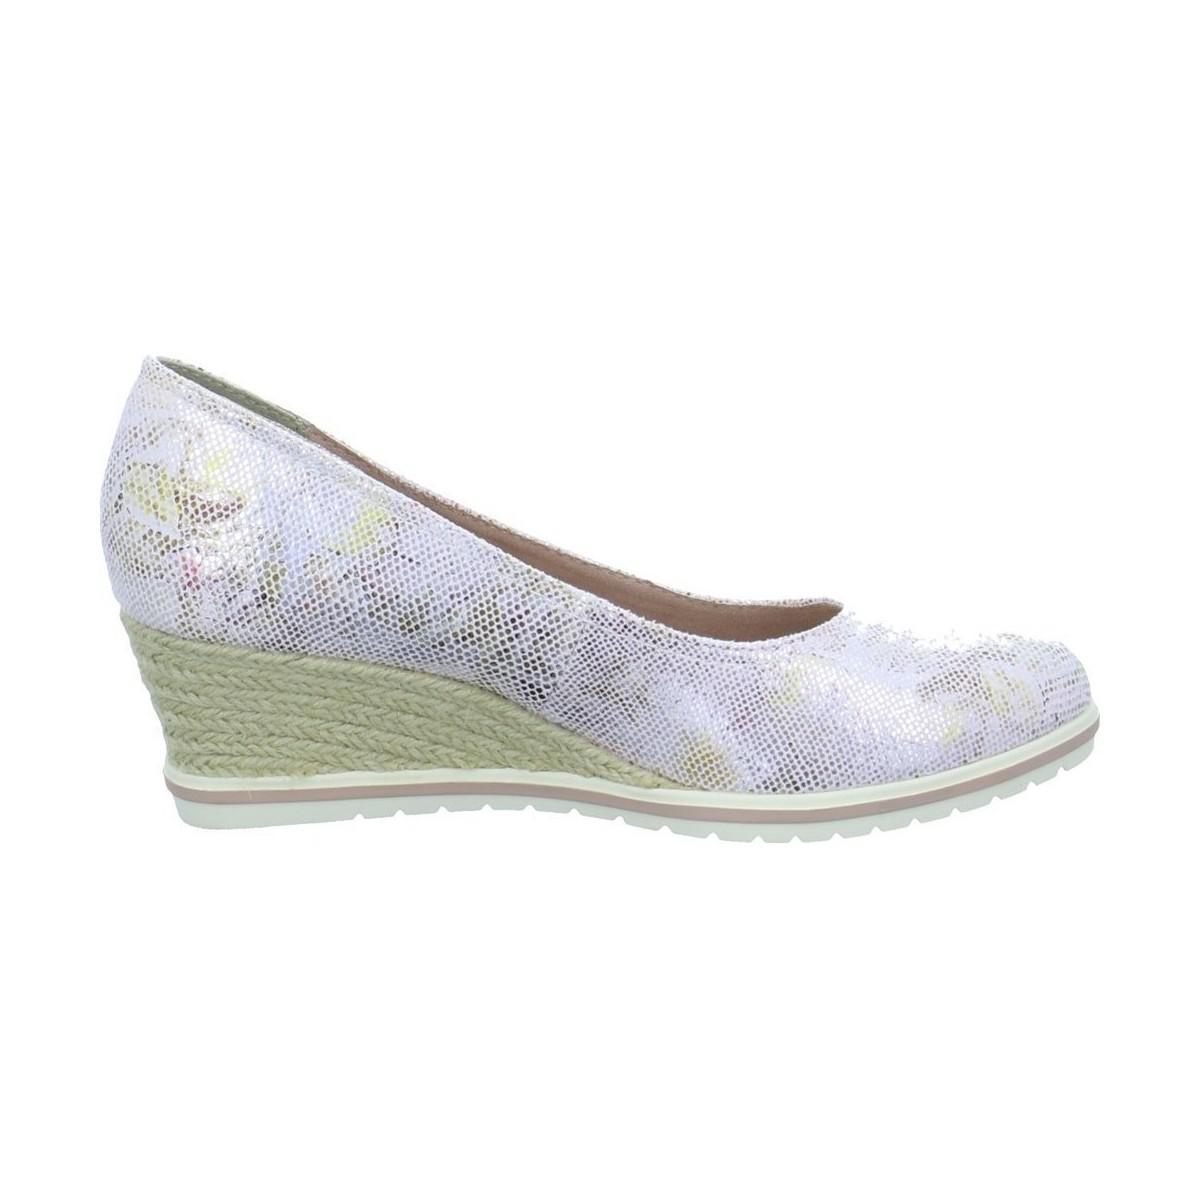 Deals Cheap Online Tamaris Rosario Keil women's Court Shoes in Cheap Sale Excellent Free Shipping Largest Supplier Footlocker Sexy Sport 9ShPiwtoRF